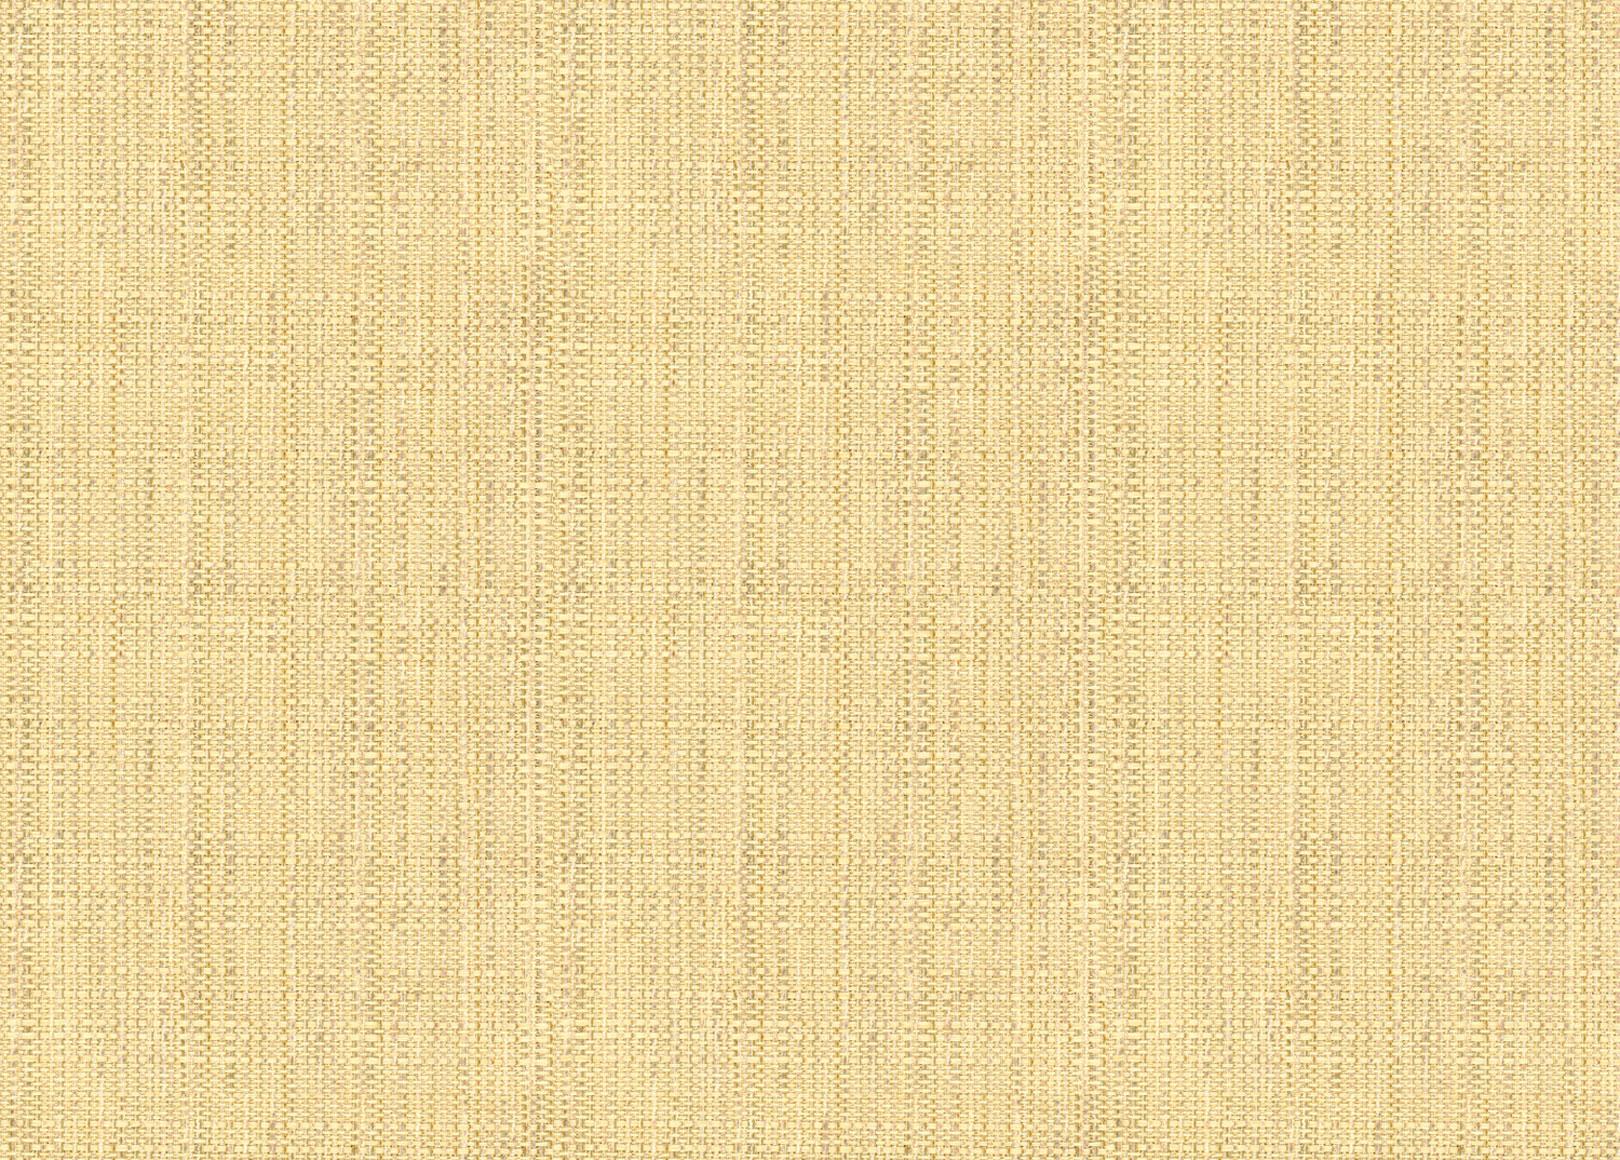 Vista Cream Fabric  Fabrics  Ethan Allen